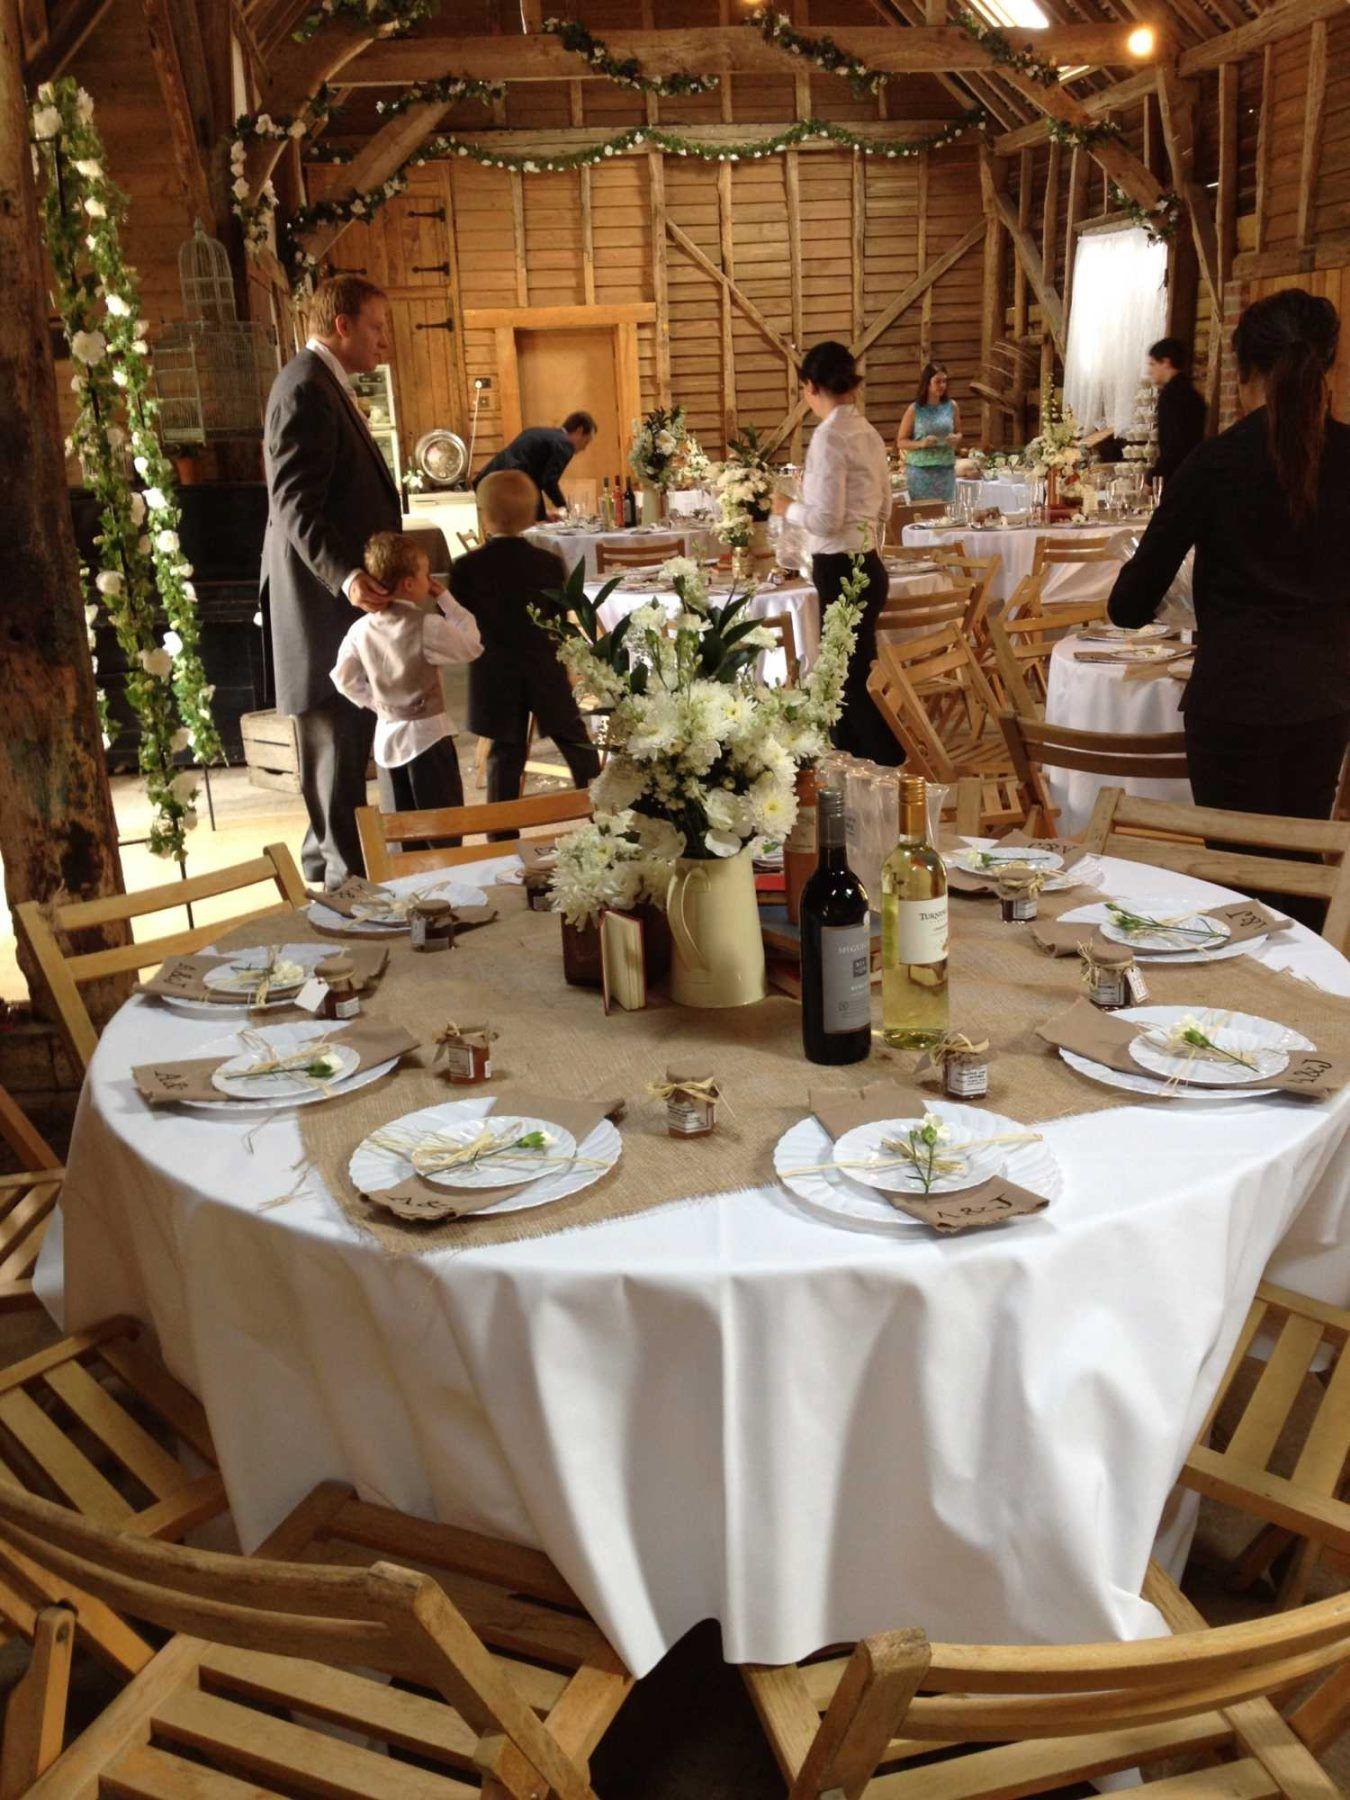 Home Decor Plants Rustic Wedding Table Decor Round Wedding Tables Rustic Wedding Table